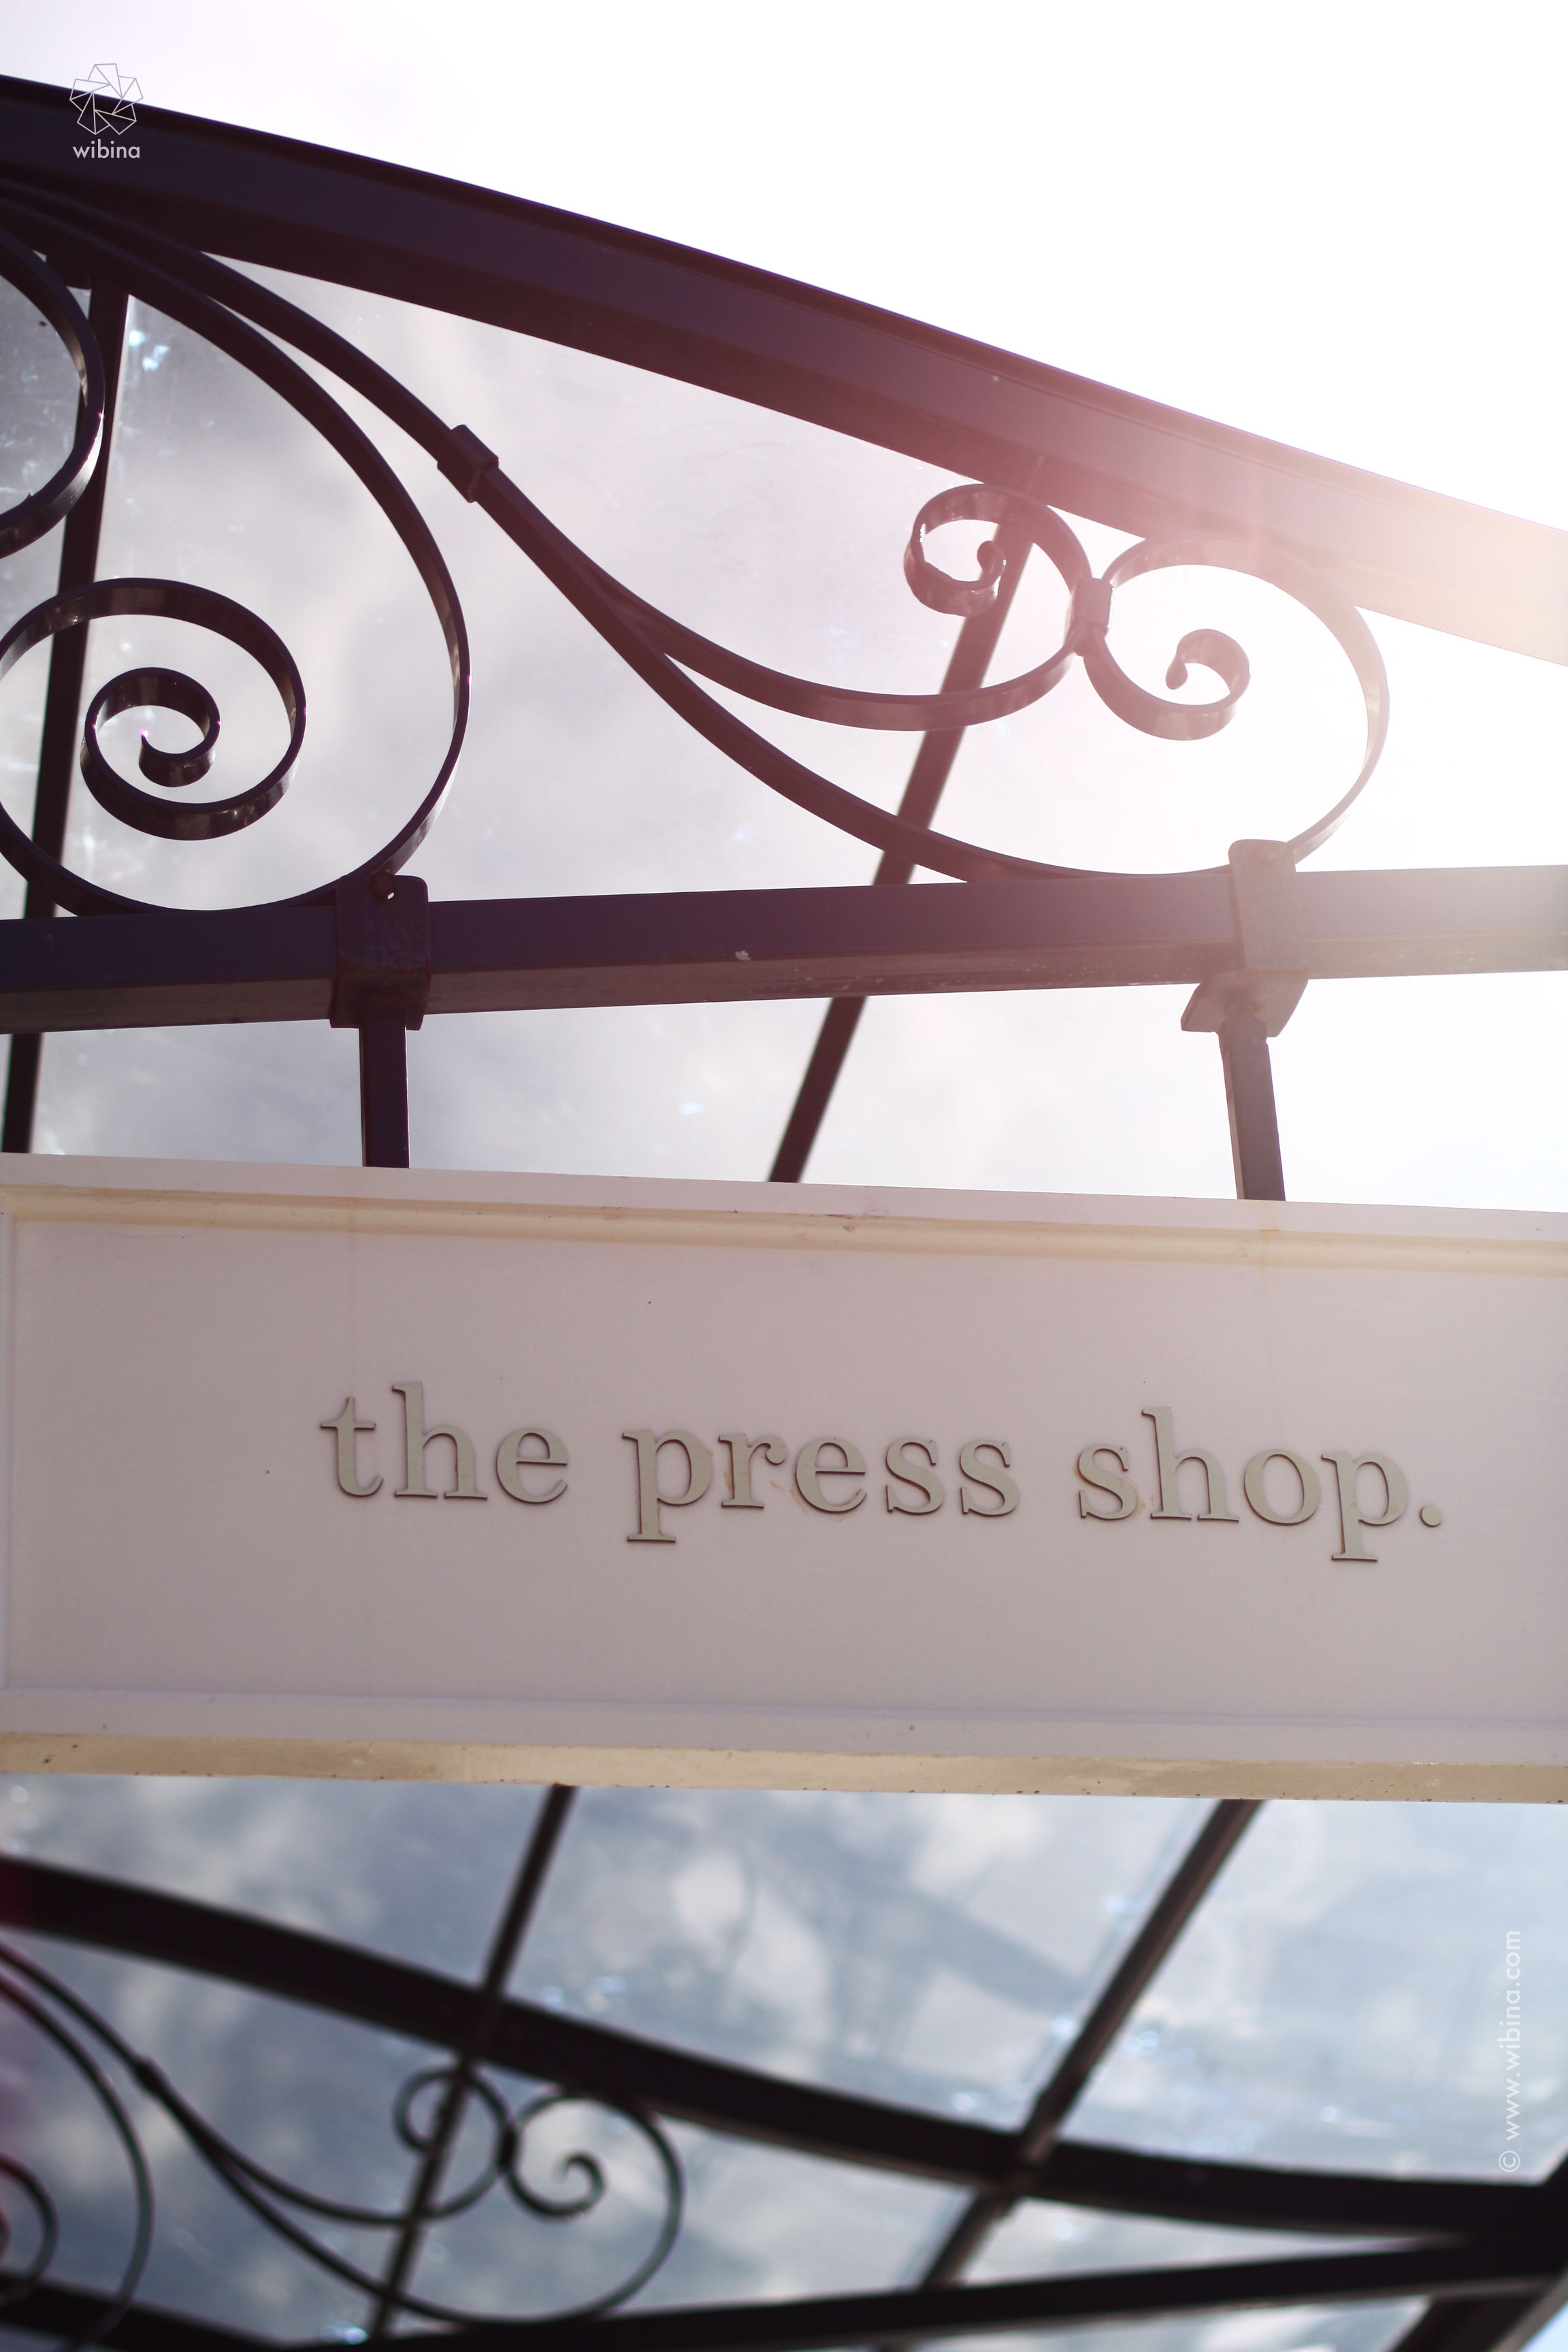 Wibina-Bowral-The_Press_Shop_11.jpg